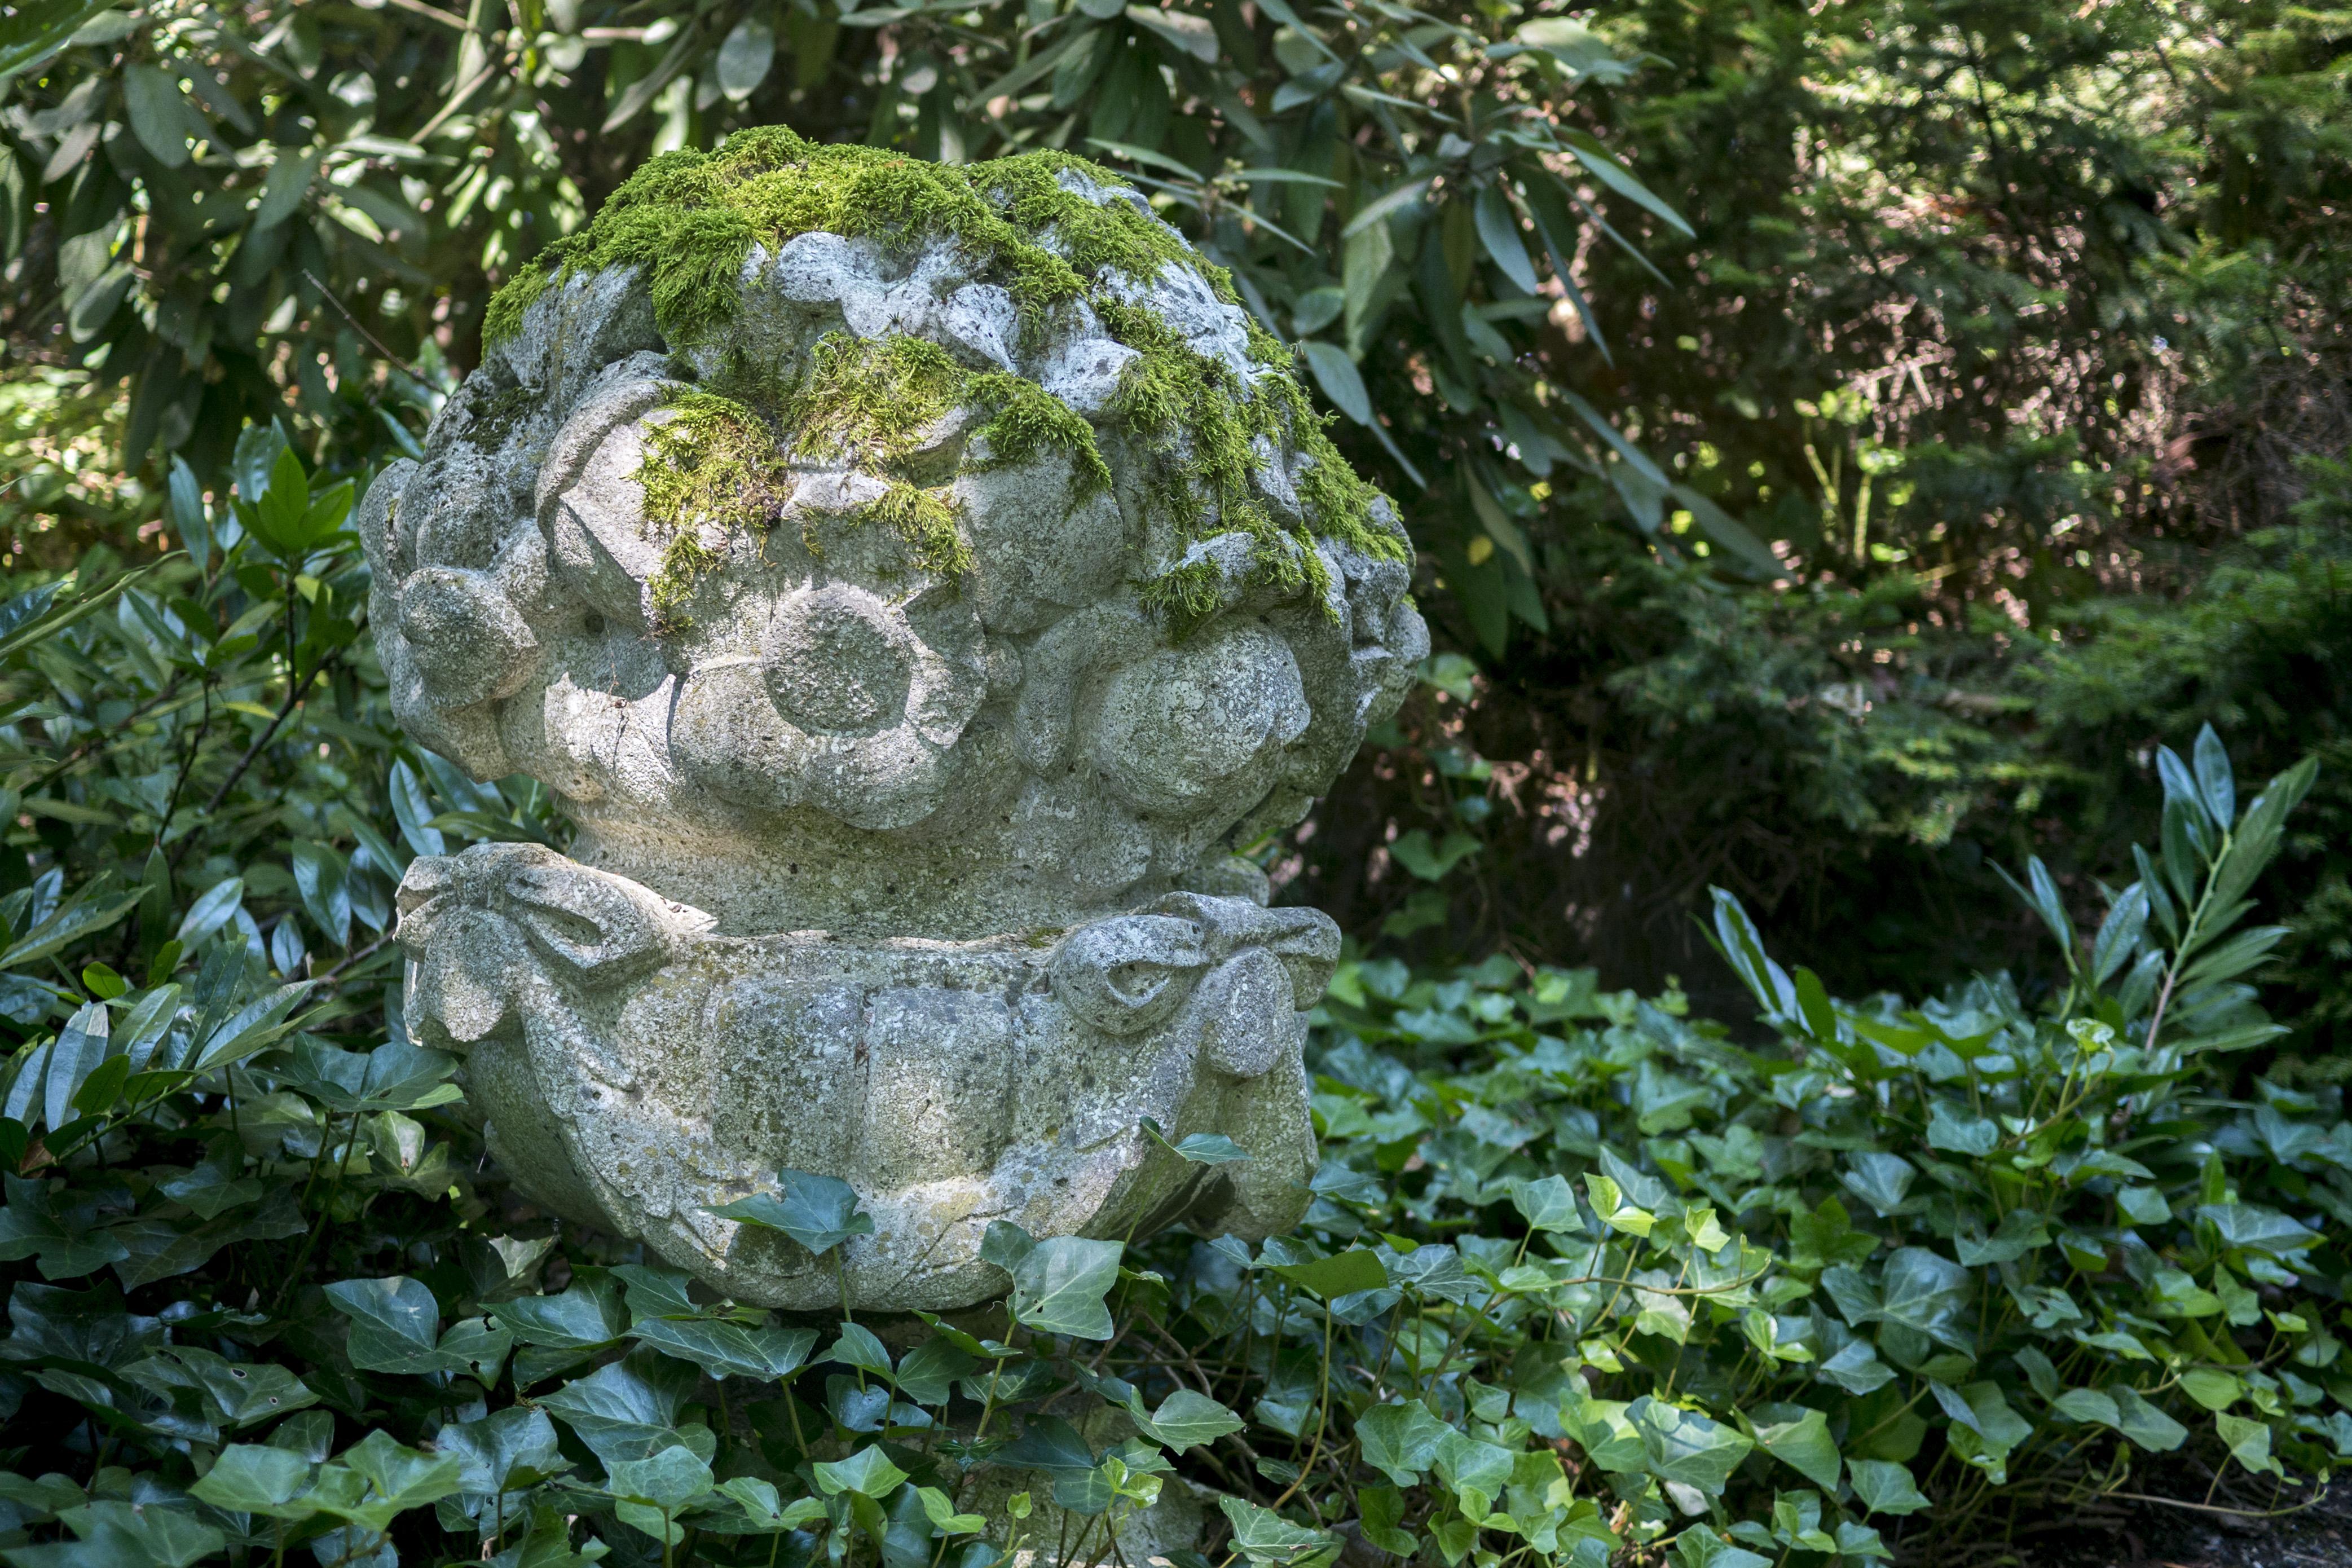 Gartenbau Linz file linz hatschekvilla gartenbaudenkmal 12 jpg wikimedia commons